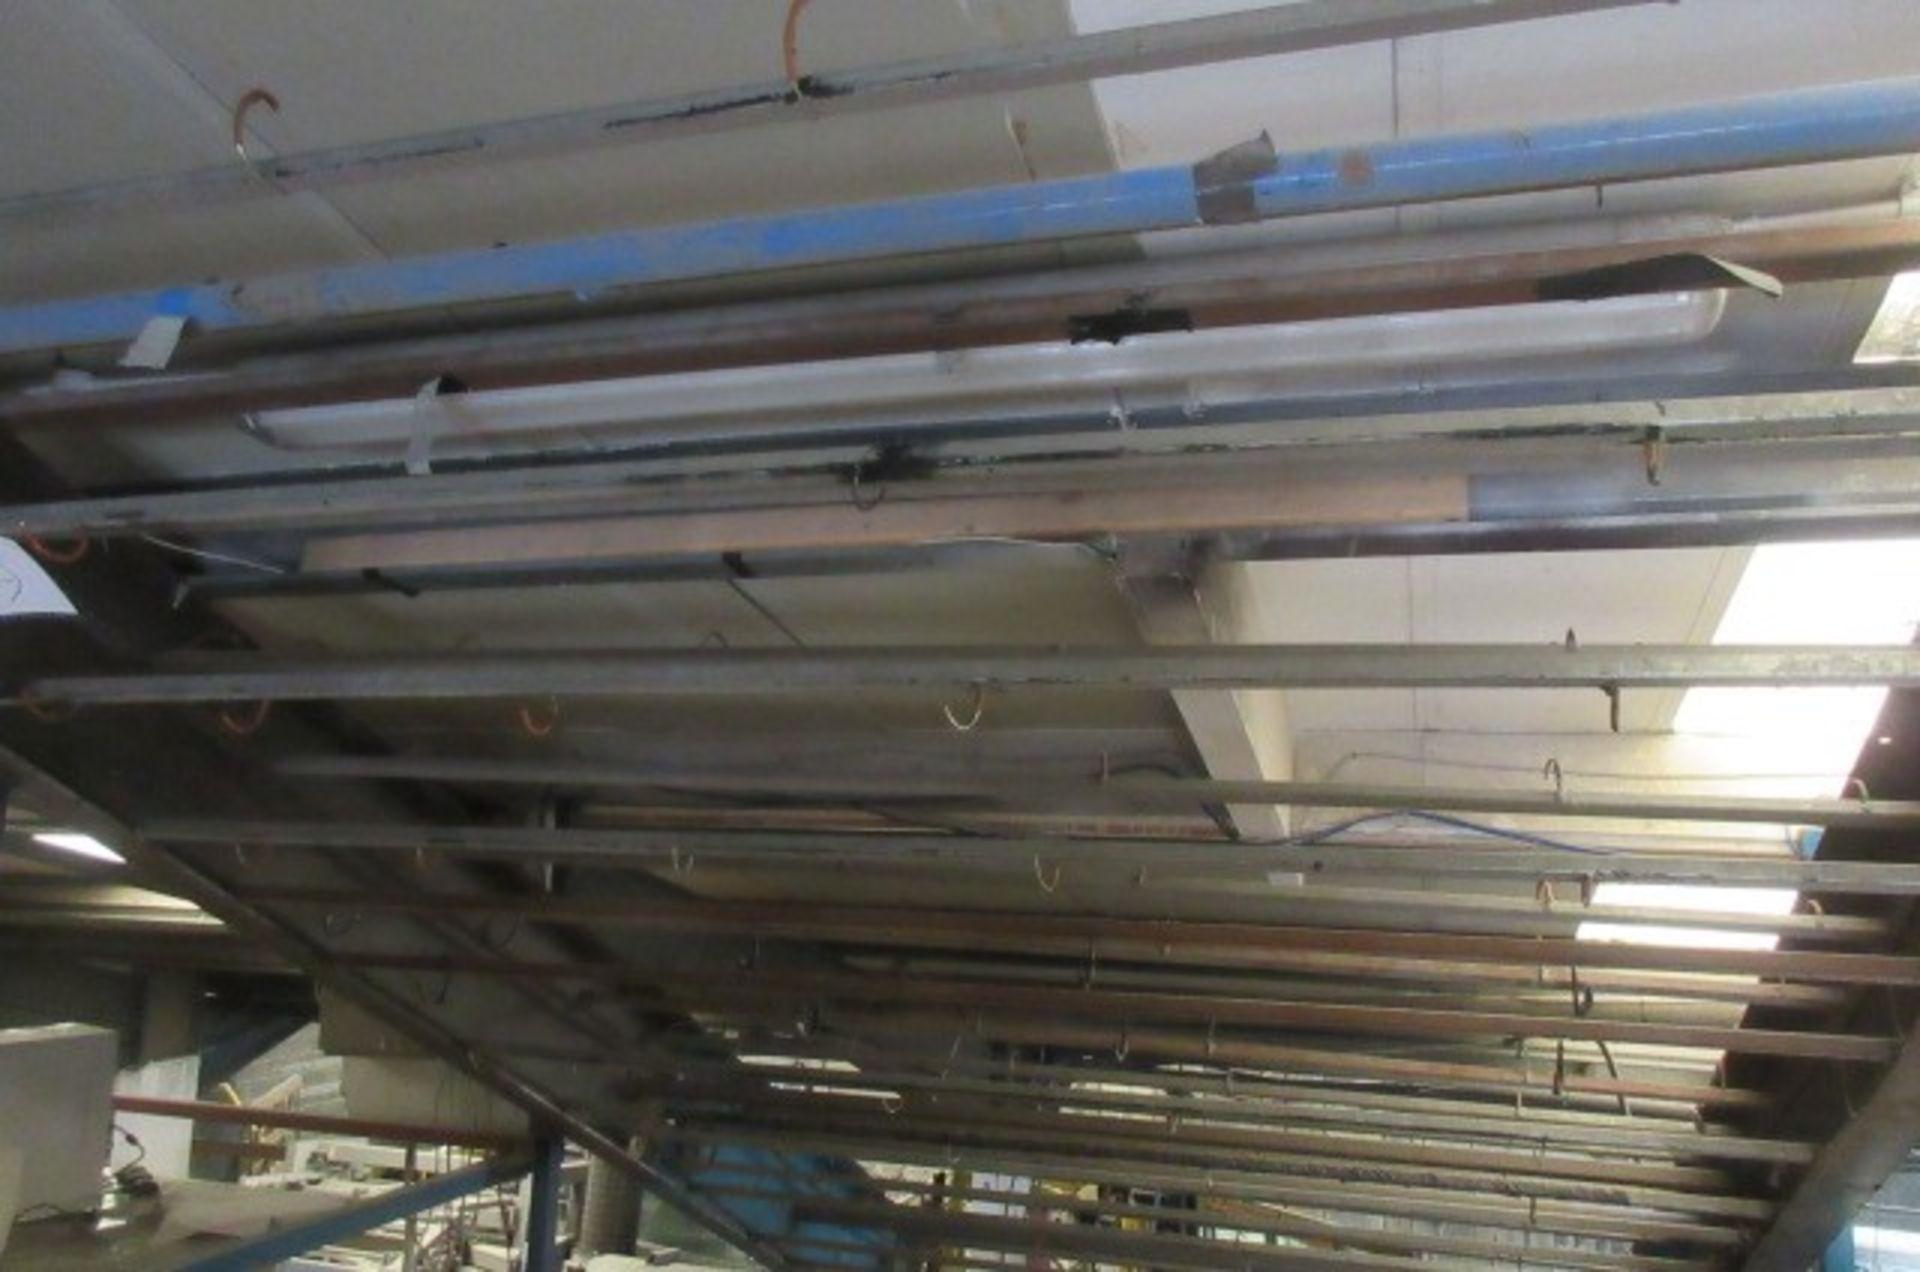 Developments & Products (Leeds) Ltd space frame conveyor - Image 2 of 3